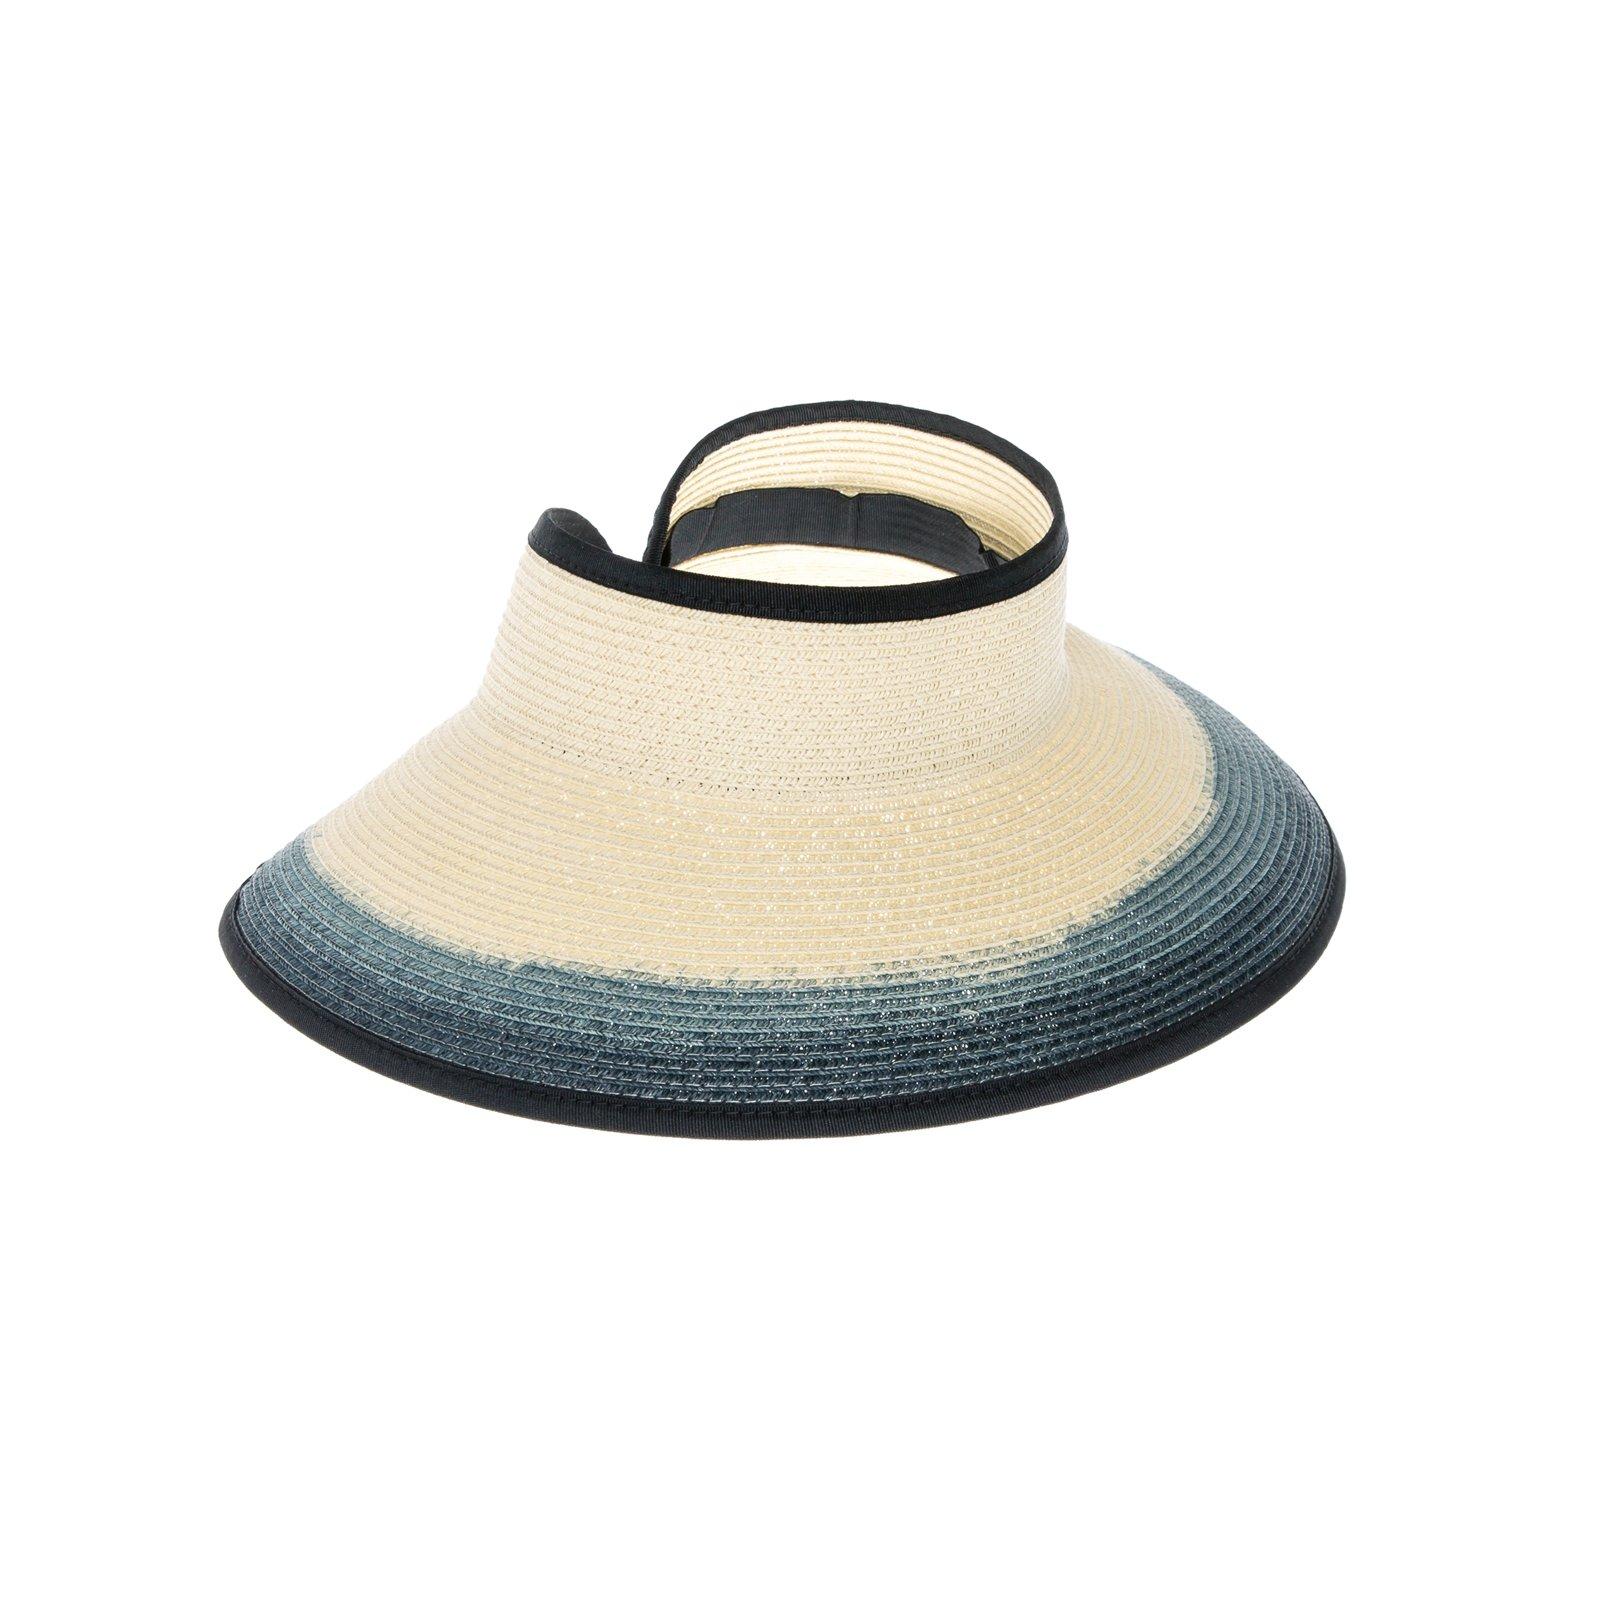 HatQuarters Wide Brim Roll-Up Sun Beach Visor, Large Floppy Ombre Straw Ponytail Visor (Black)